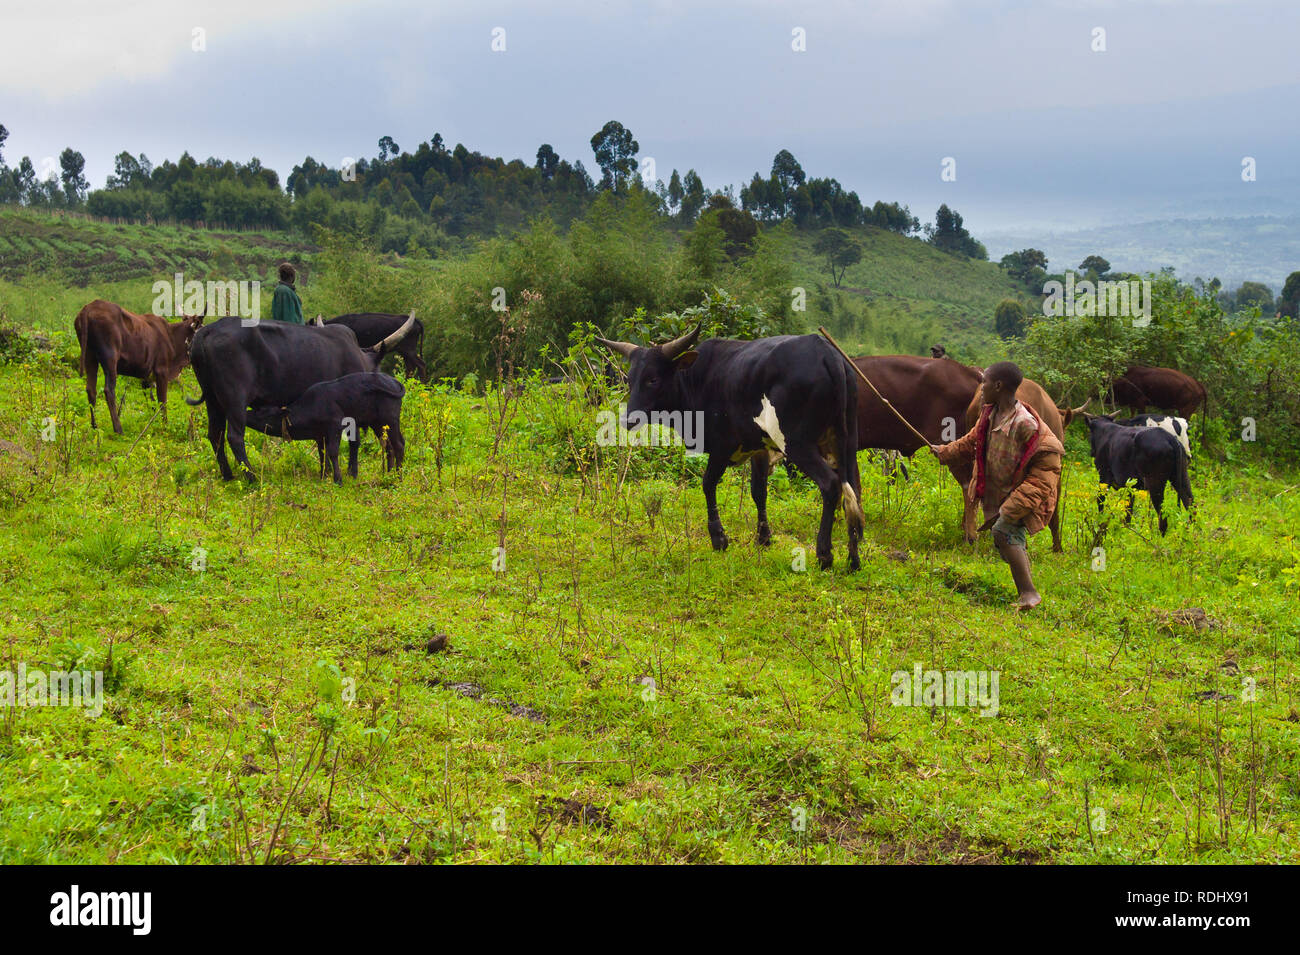 Many subsistence farmers encroach on the protected gorilola habitat of Virunga National Park, Parq National des Virunga, Democratic Republic of Congo. - Stock Image